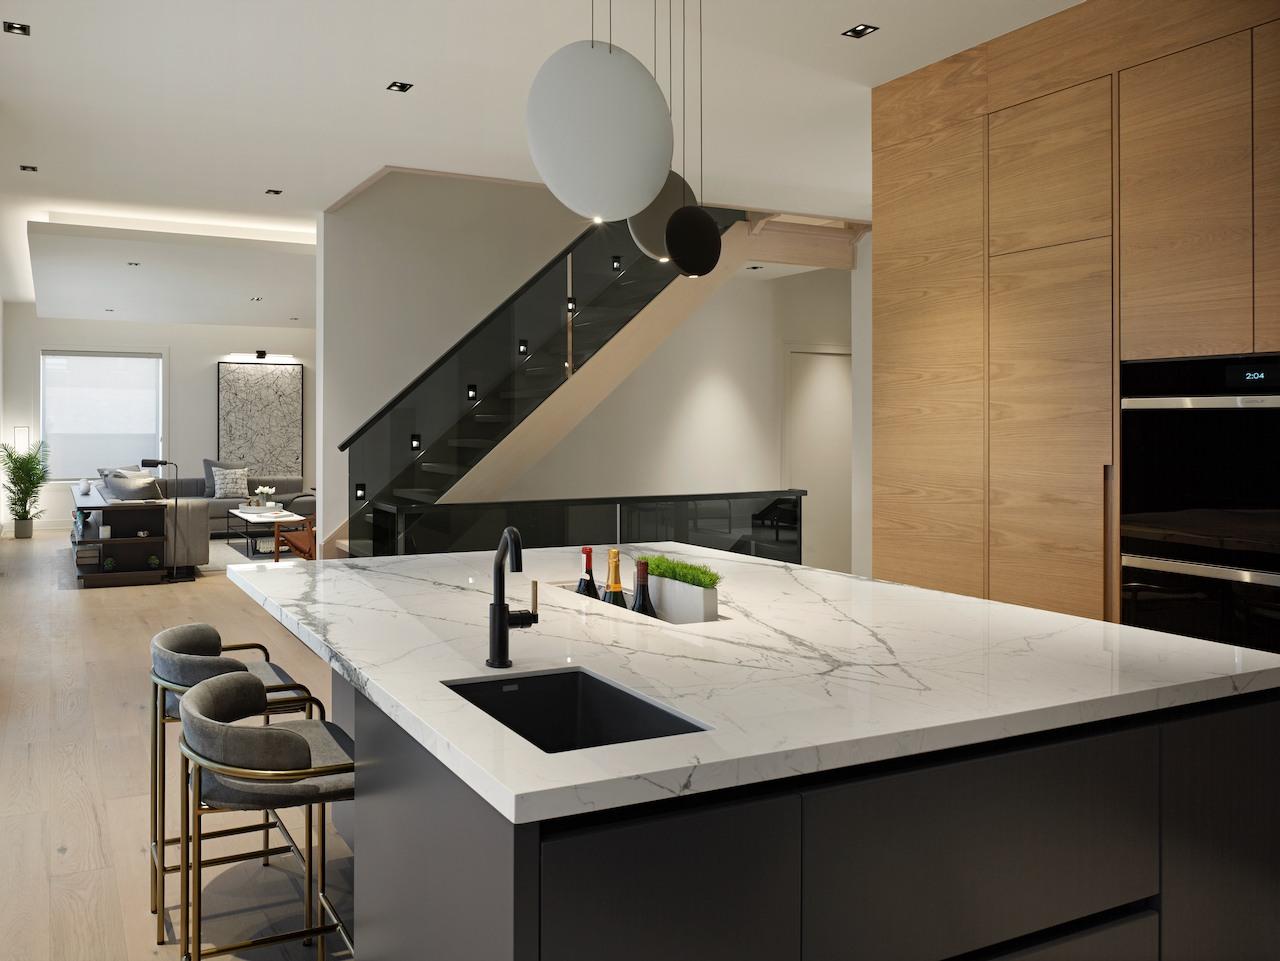 Winslow_Kitchen_Stairs